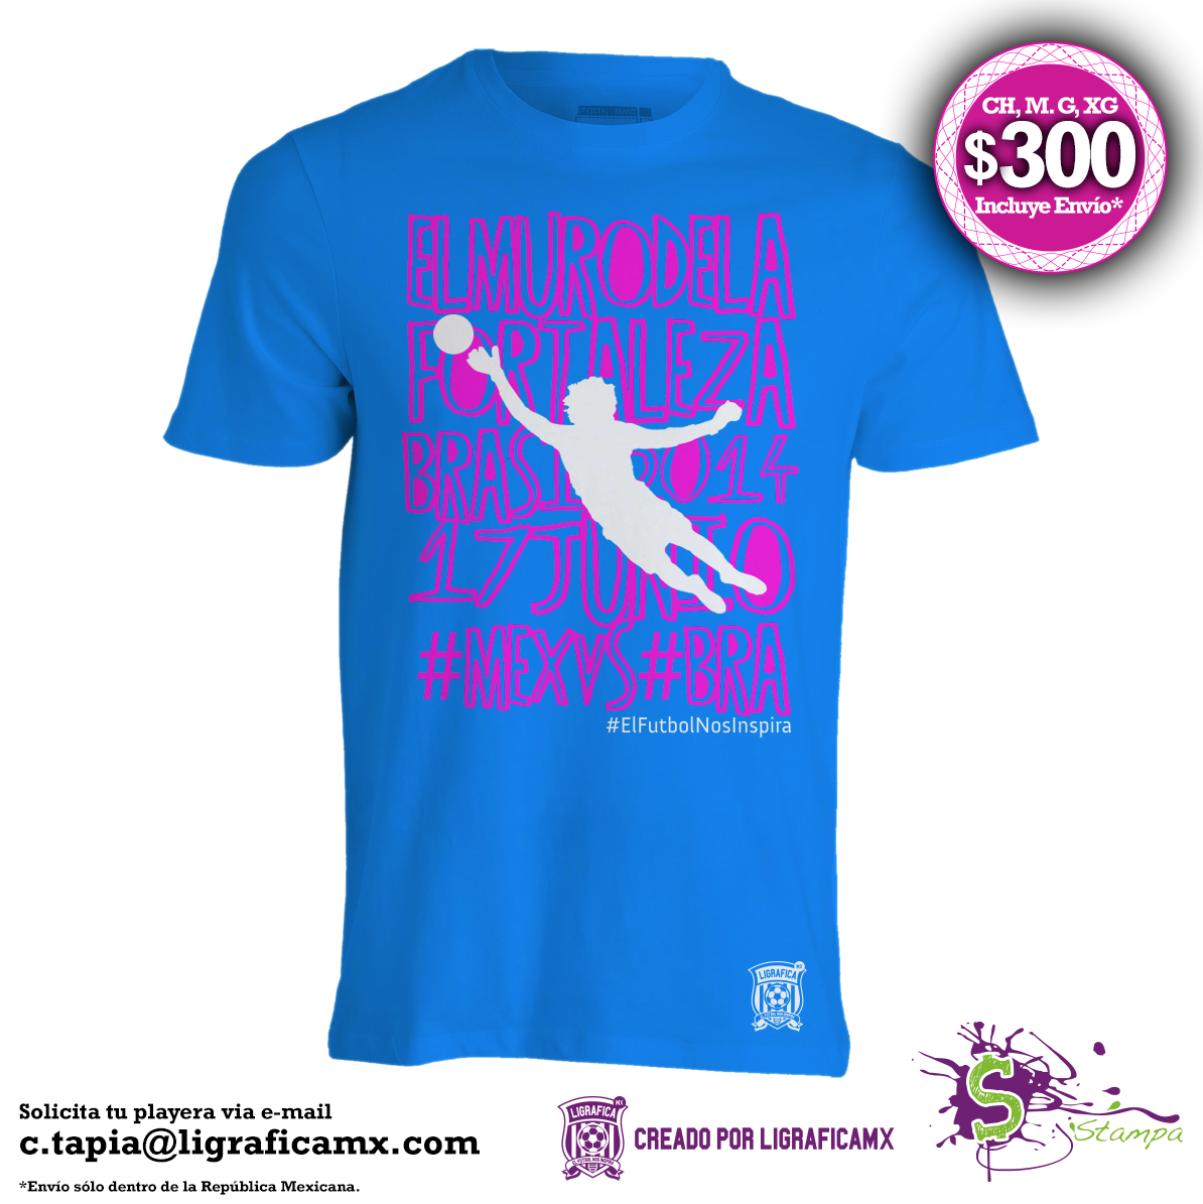 #ElMuroDeLaFortaleza #LigraficaMX • ¡Ya está a la venta! • Solicítala via mail: c.tapia@ligraficamx.com